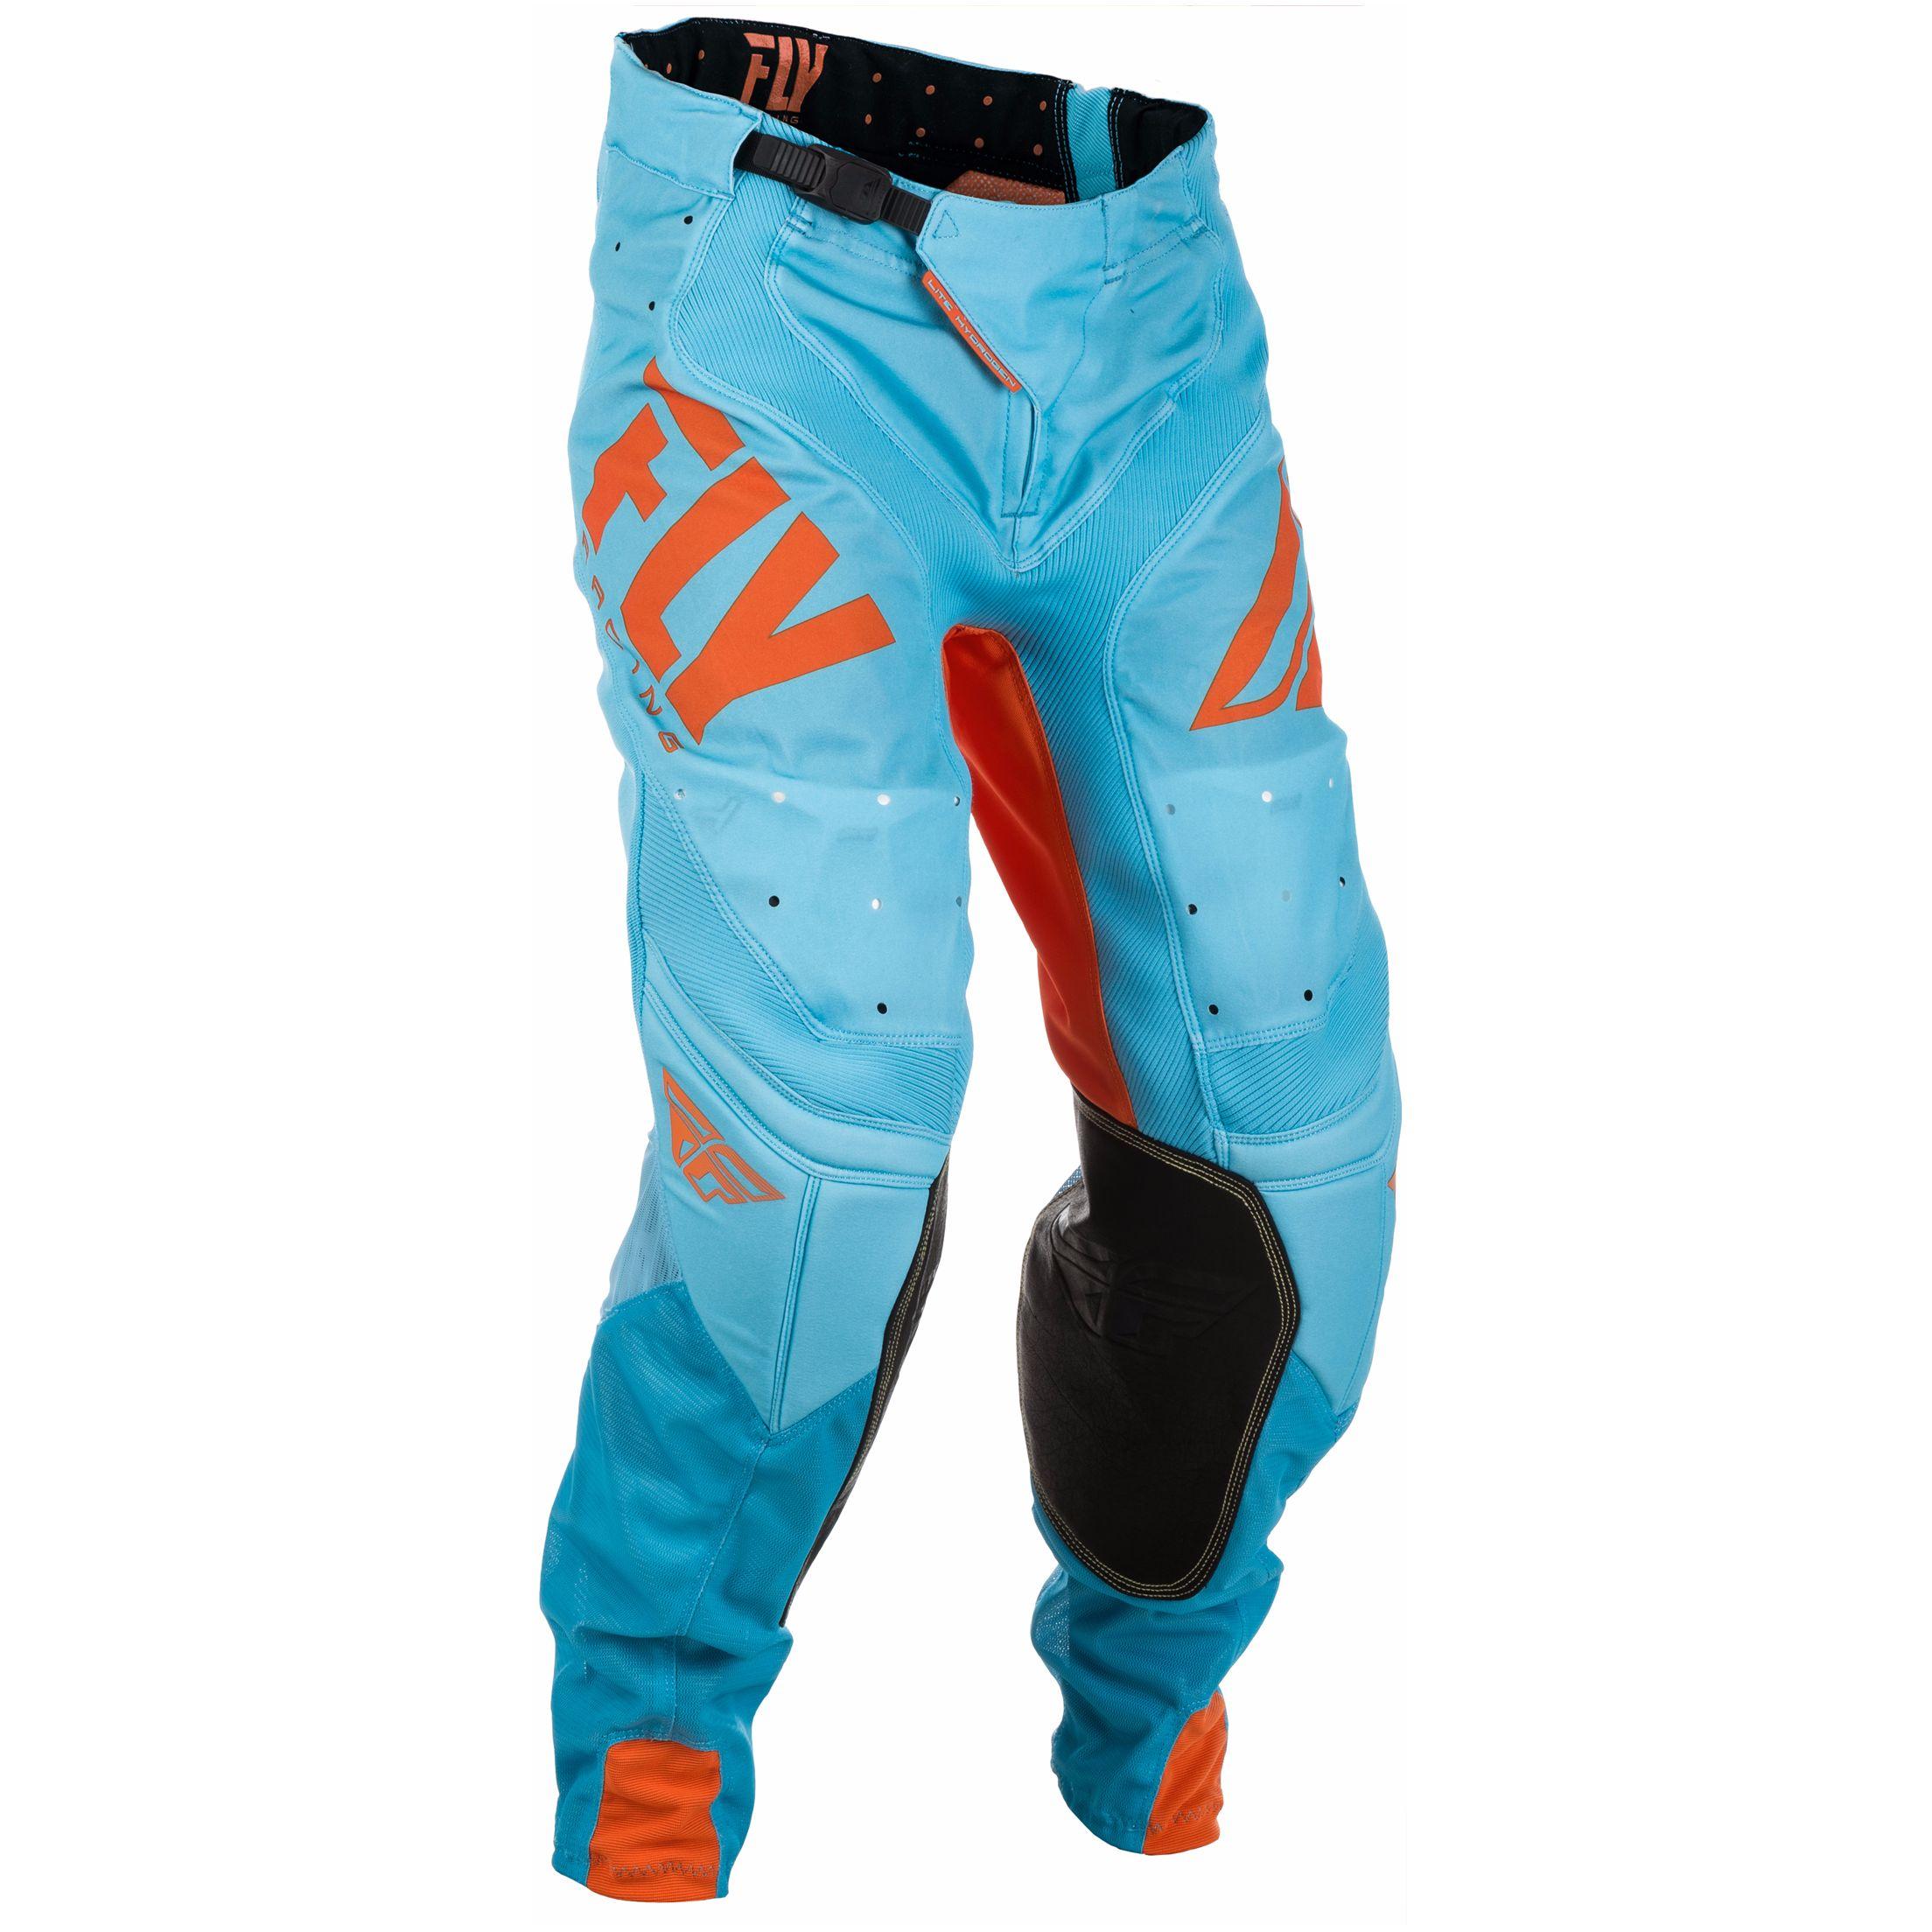 pantalon cross fly lite hydrogen orange bleu 2018 tenue cross. Black Bedroom Furniture Sets. Home Design Ideas